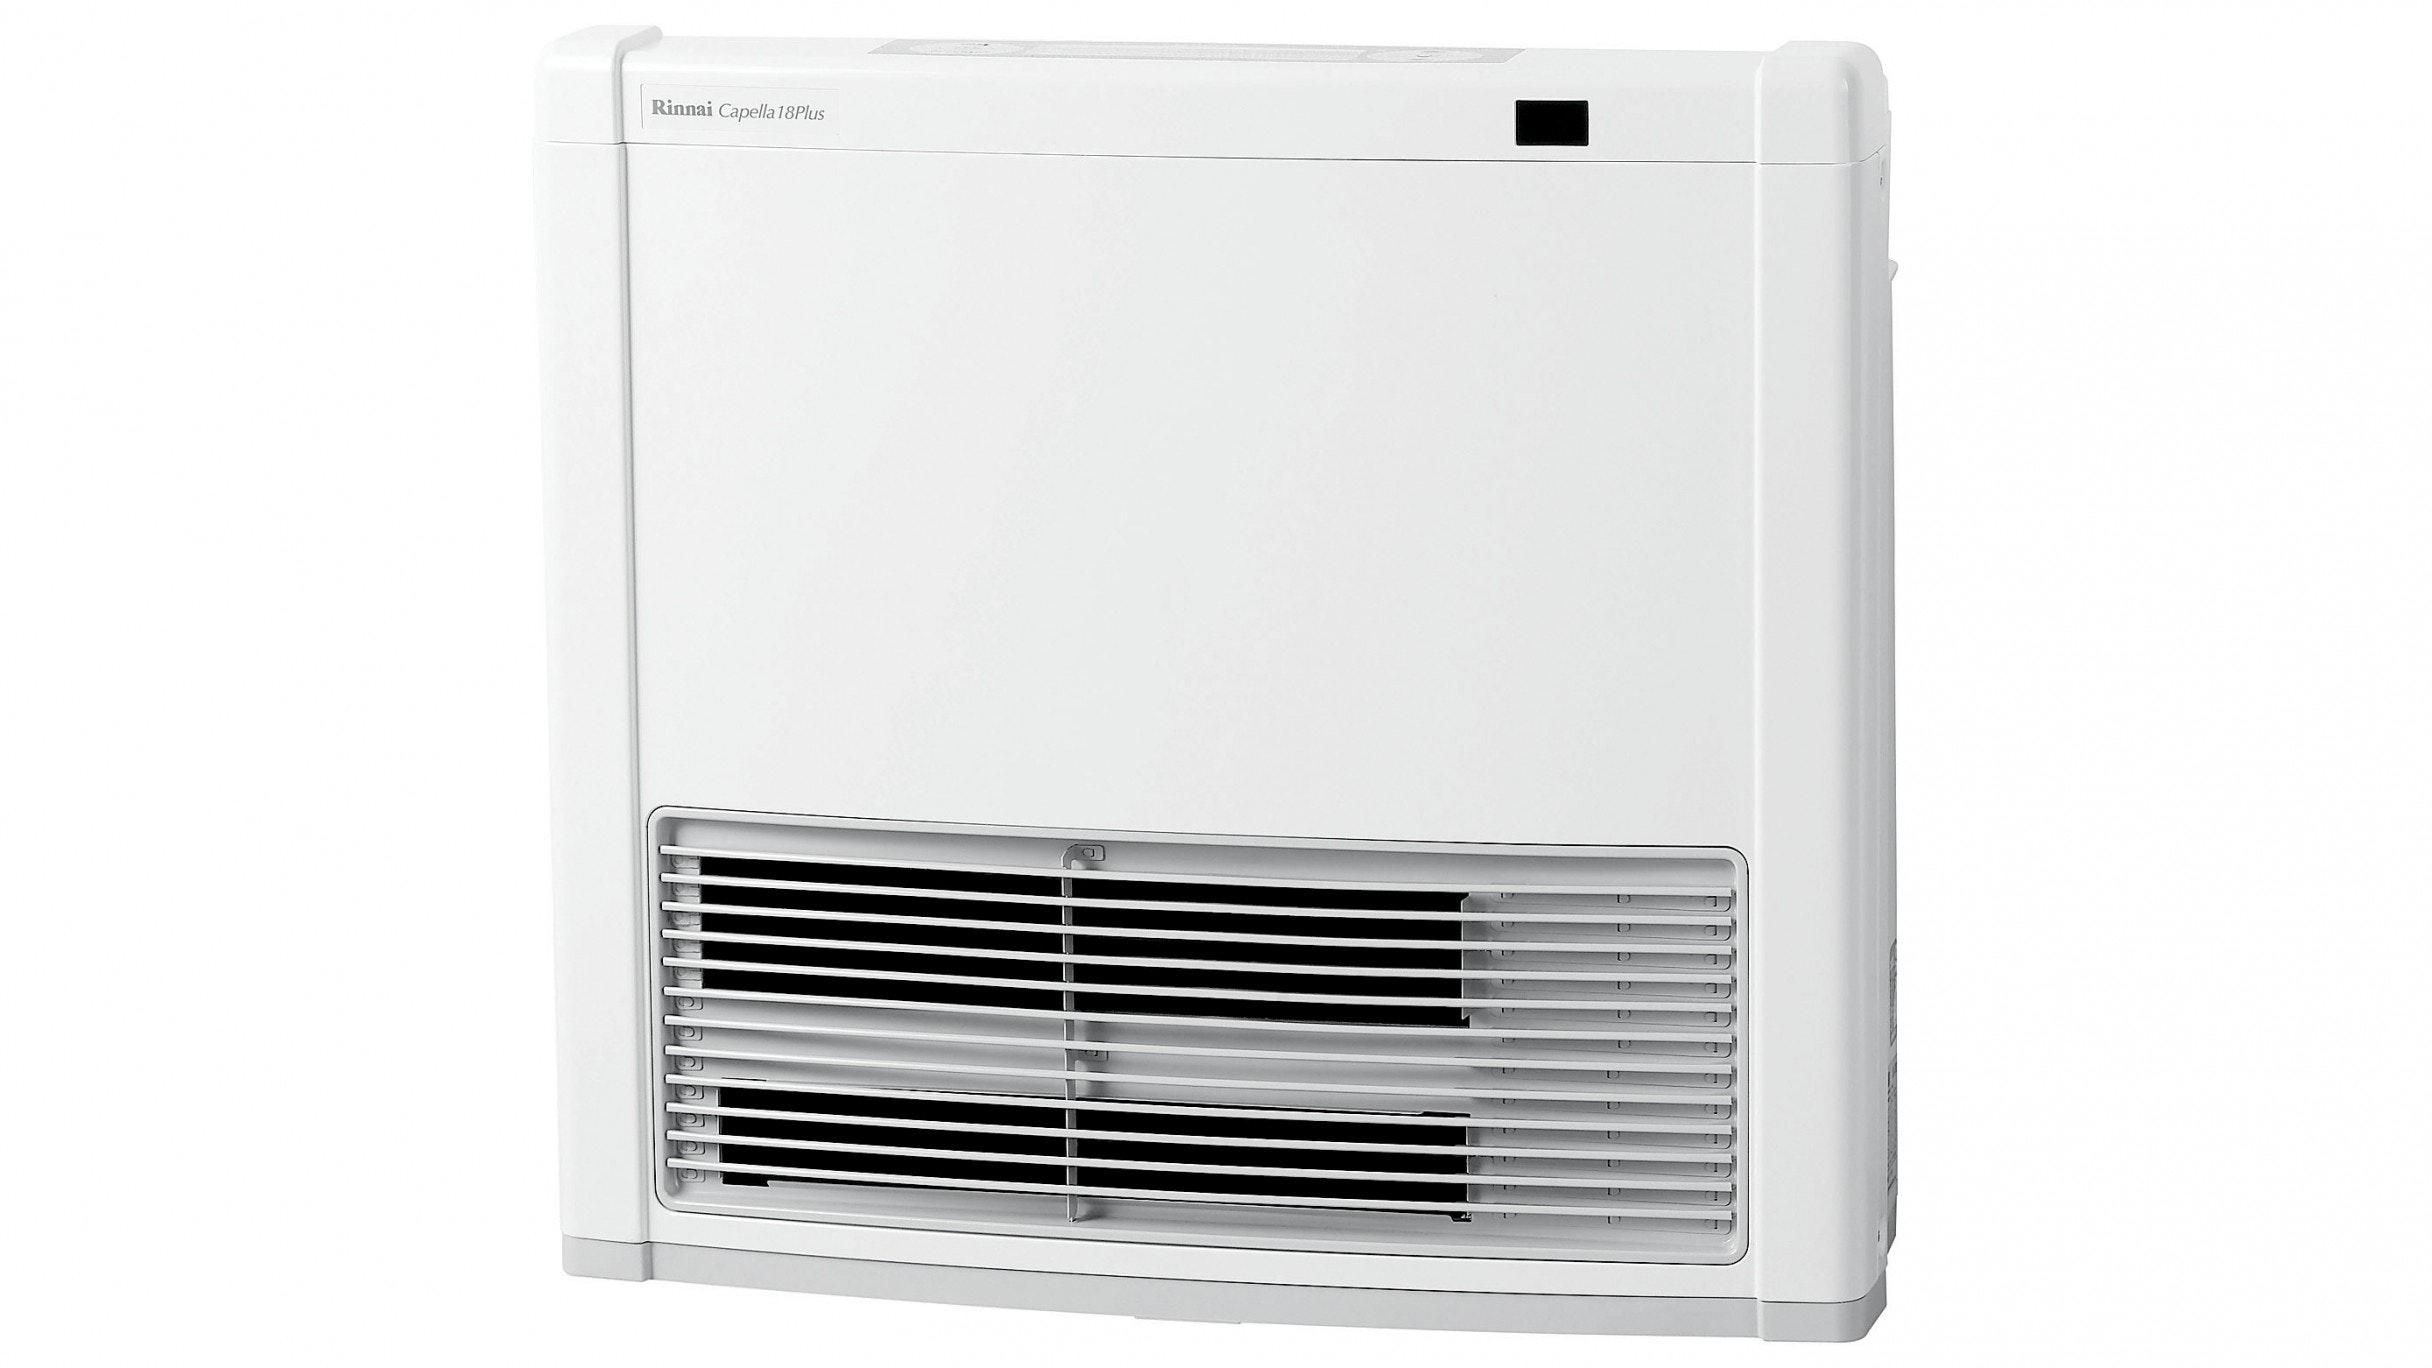 Rinnai Capella 18 Plus Natural Gas Convertor Heater - White